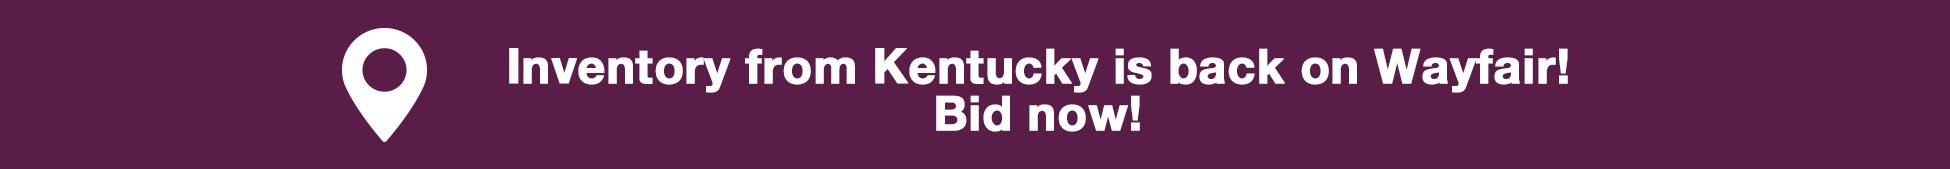 Kentucky Inventory